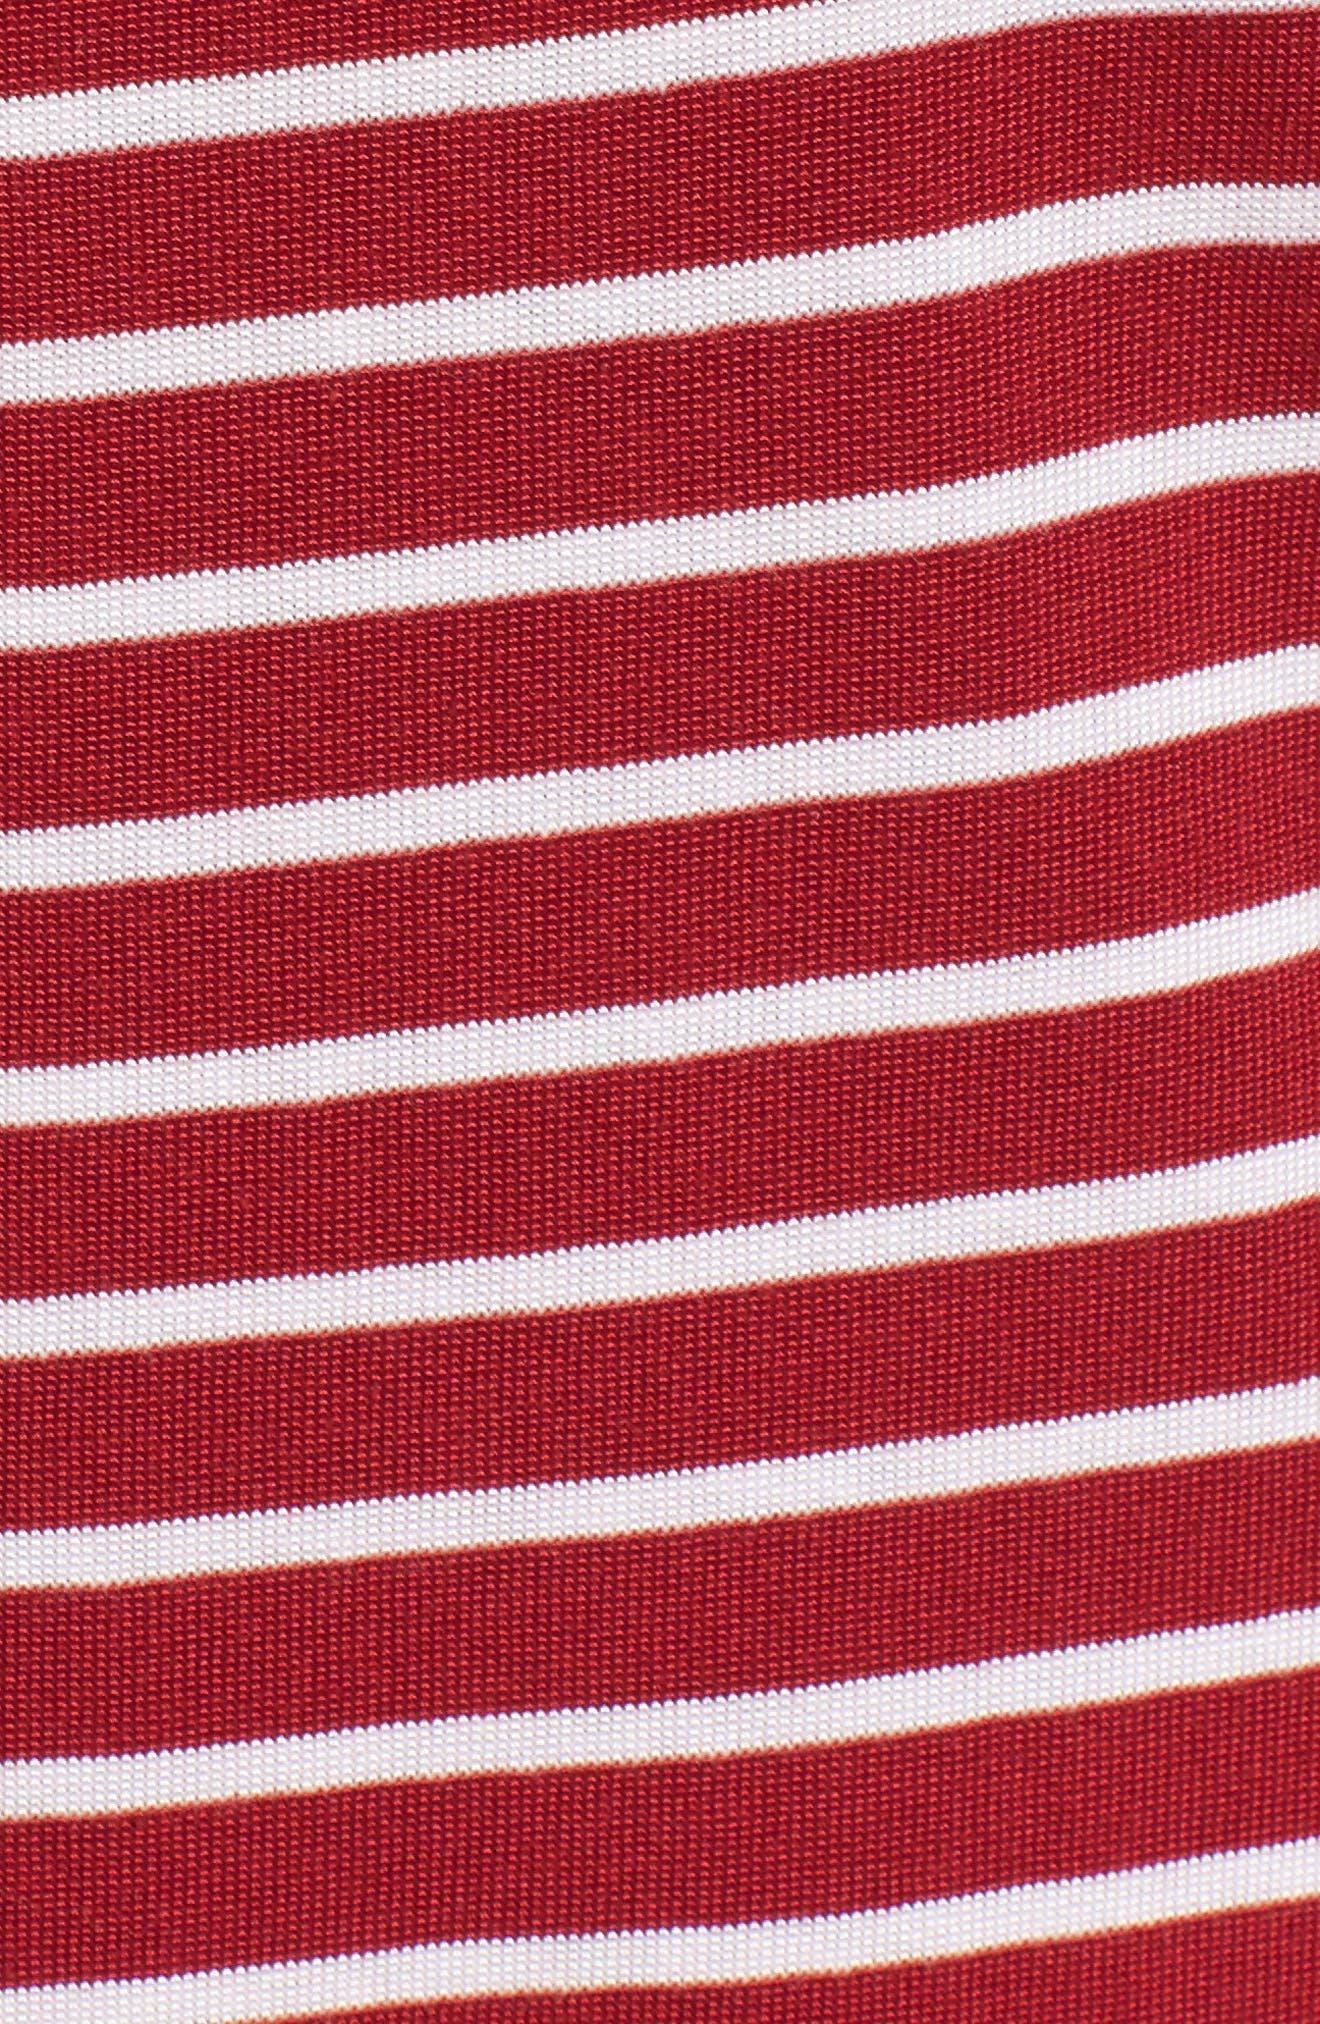 Dalmore Stripe Jersey Sleeveless Shift Dress,                             Alternate thumbnail 5, color,                             630